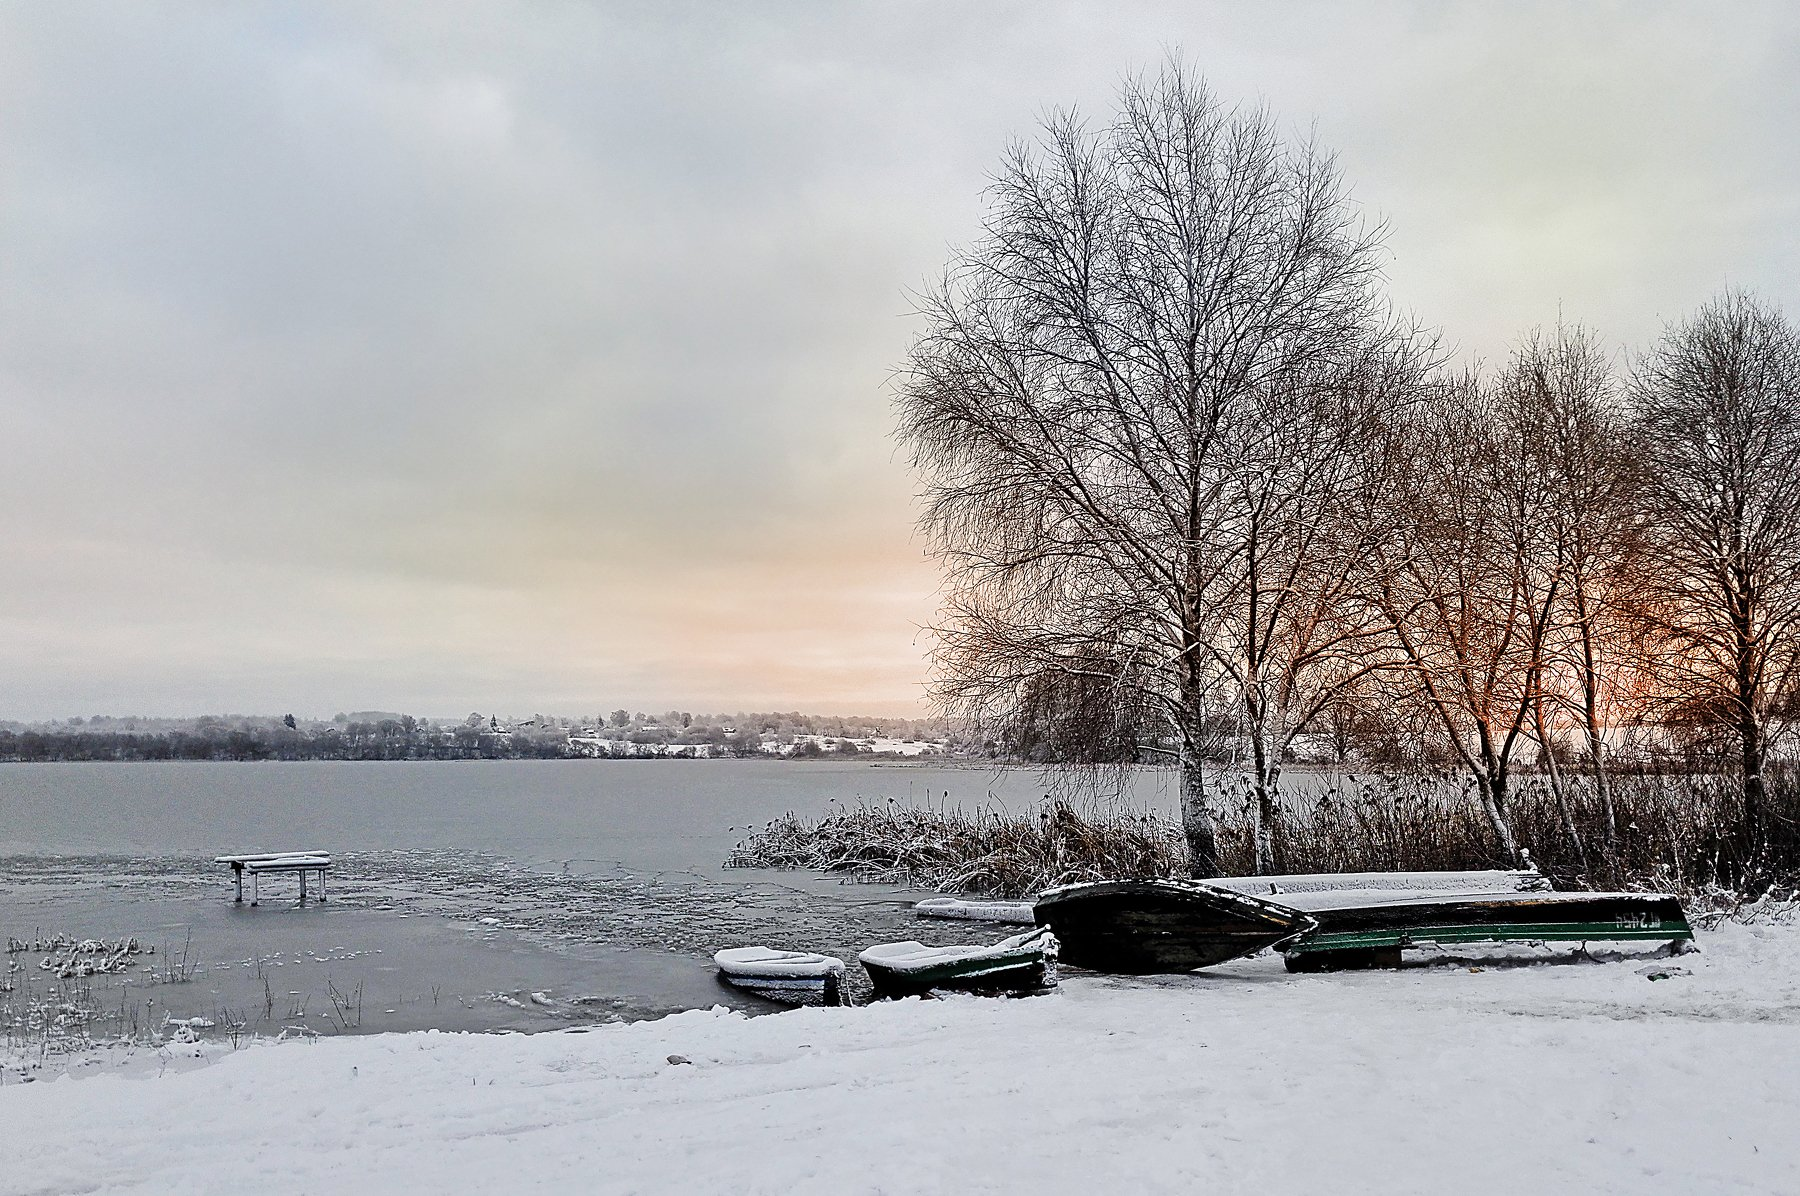 лодки берег зима лед холод мороз закат беларусь озеро вода берег деревья помолейко pomoleyko снег, Павел Помолейко